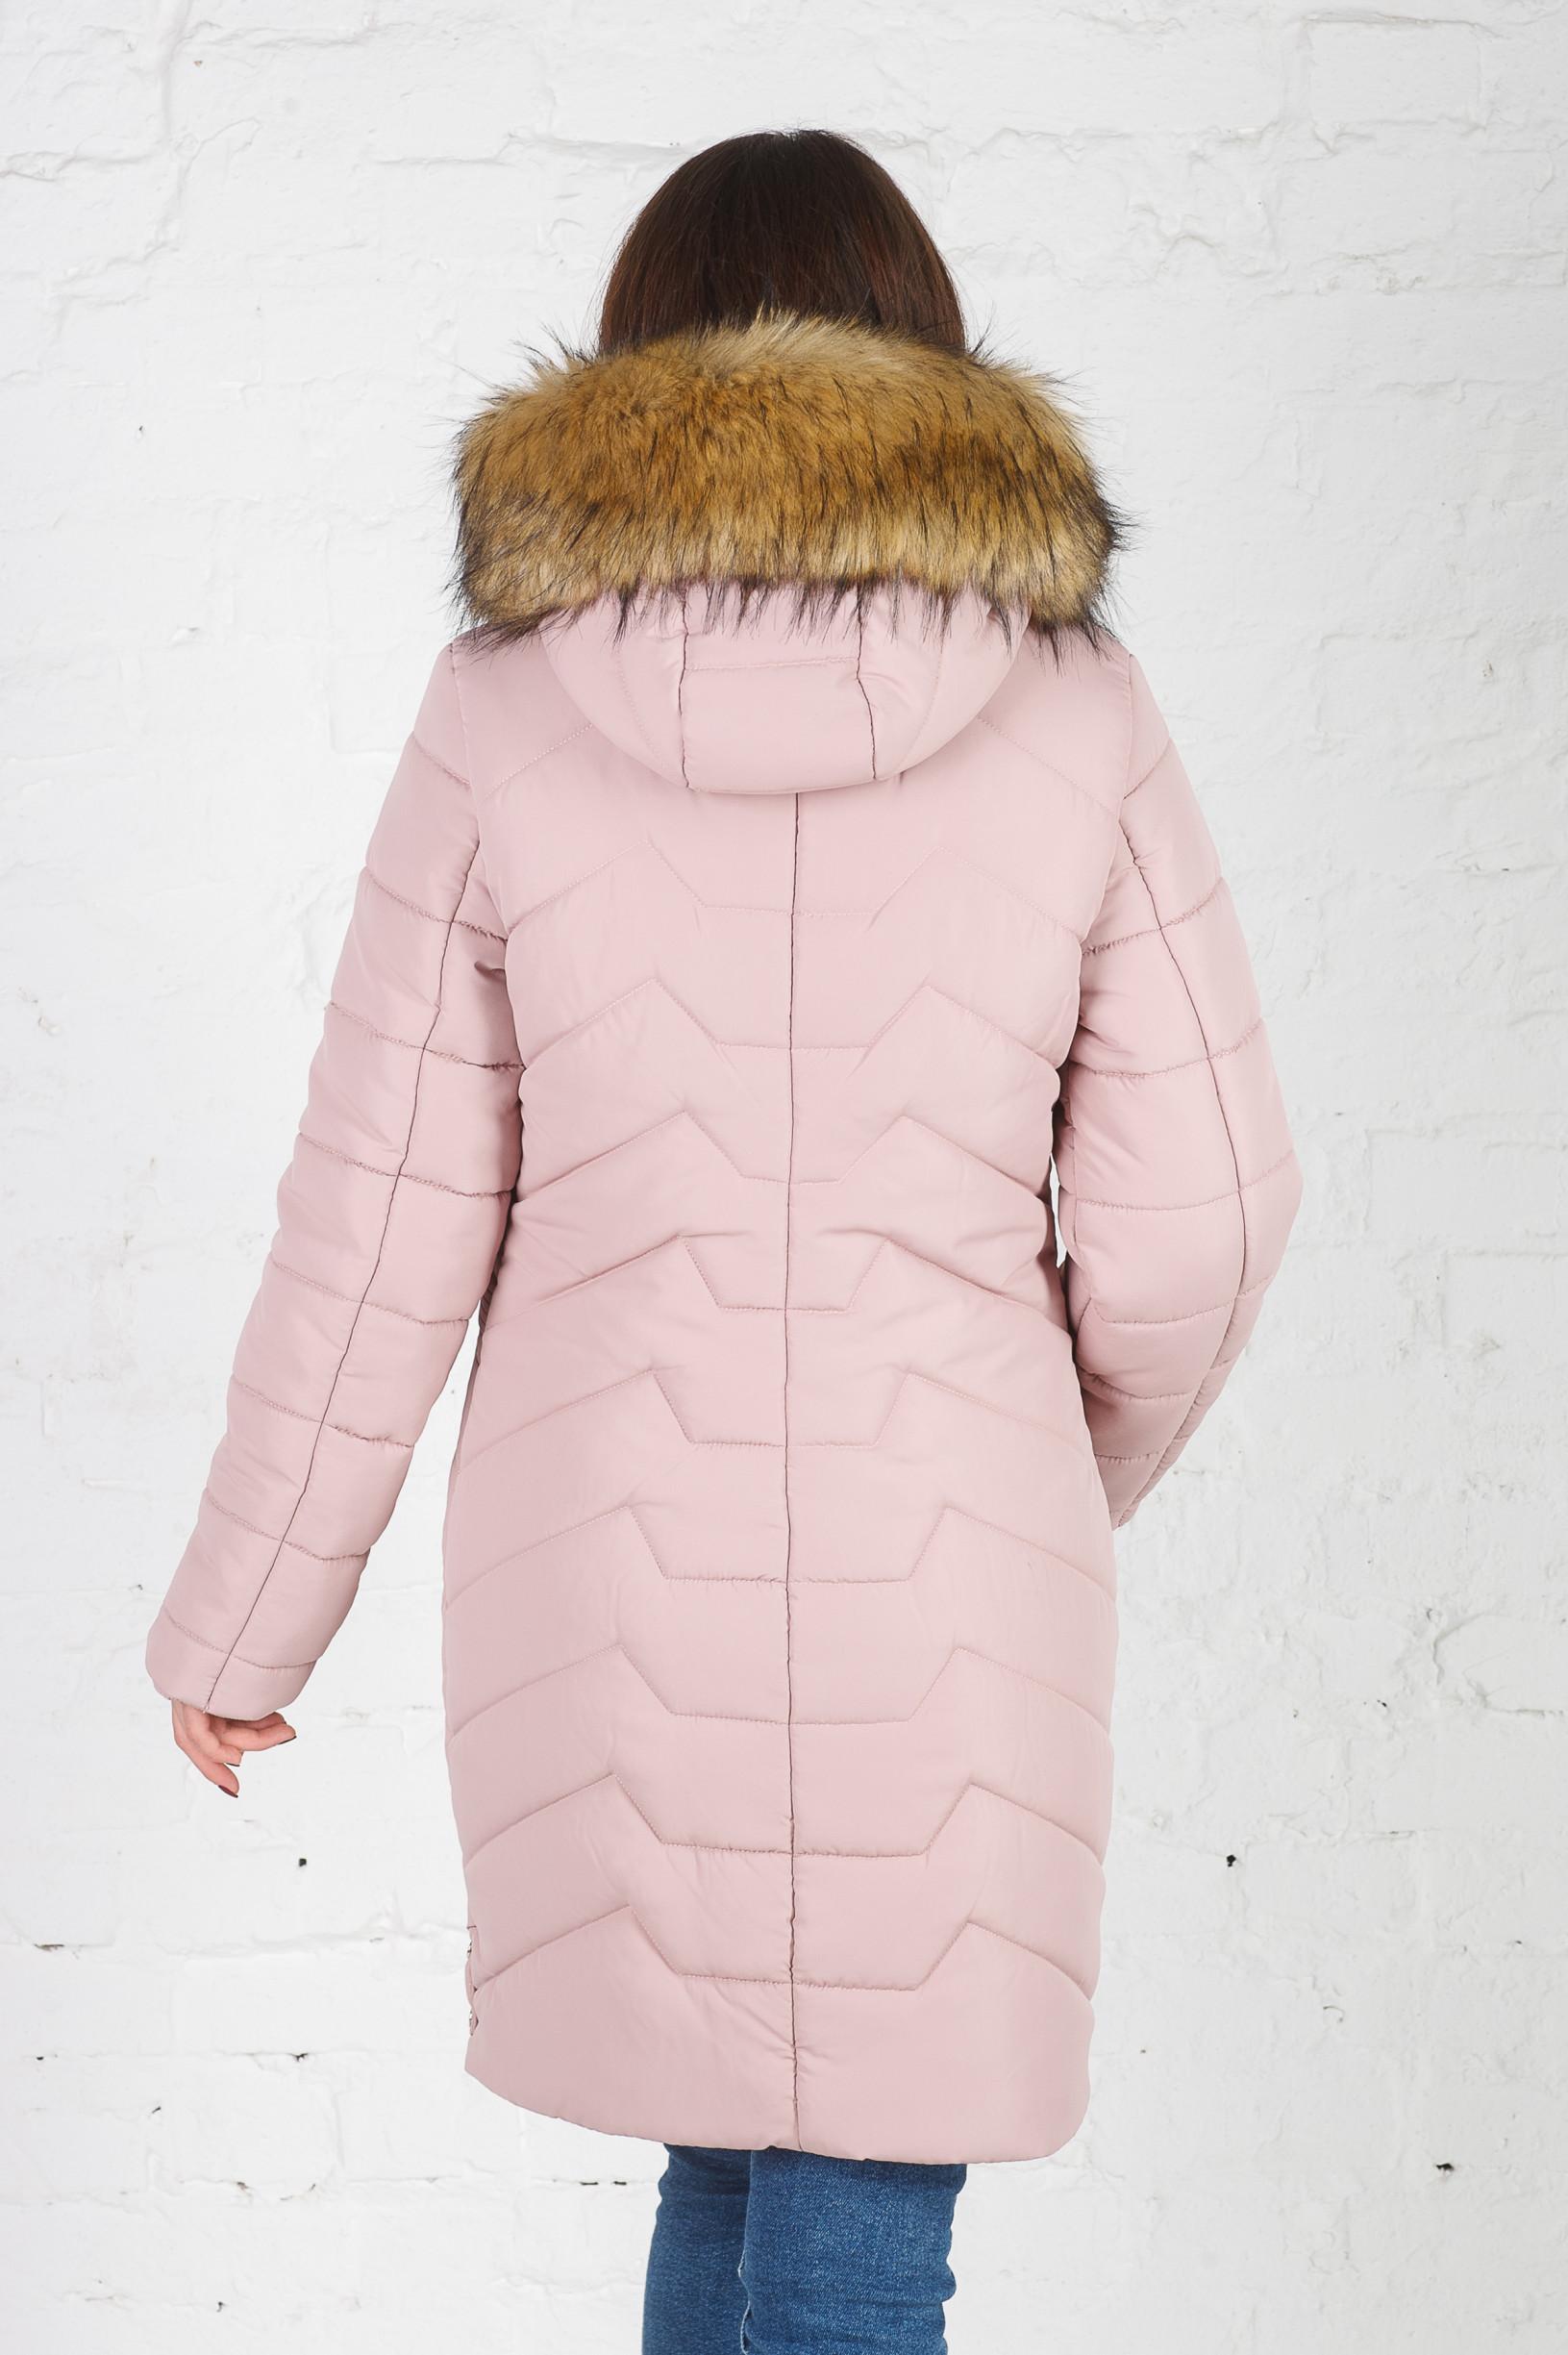 Зимняя удлинённая куртка для девушки Кети пудра